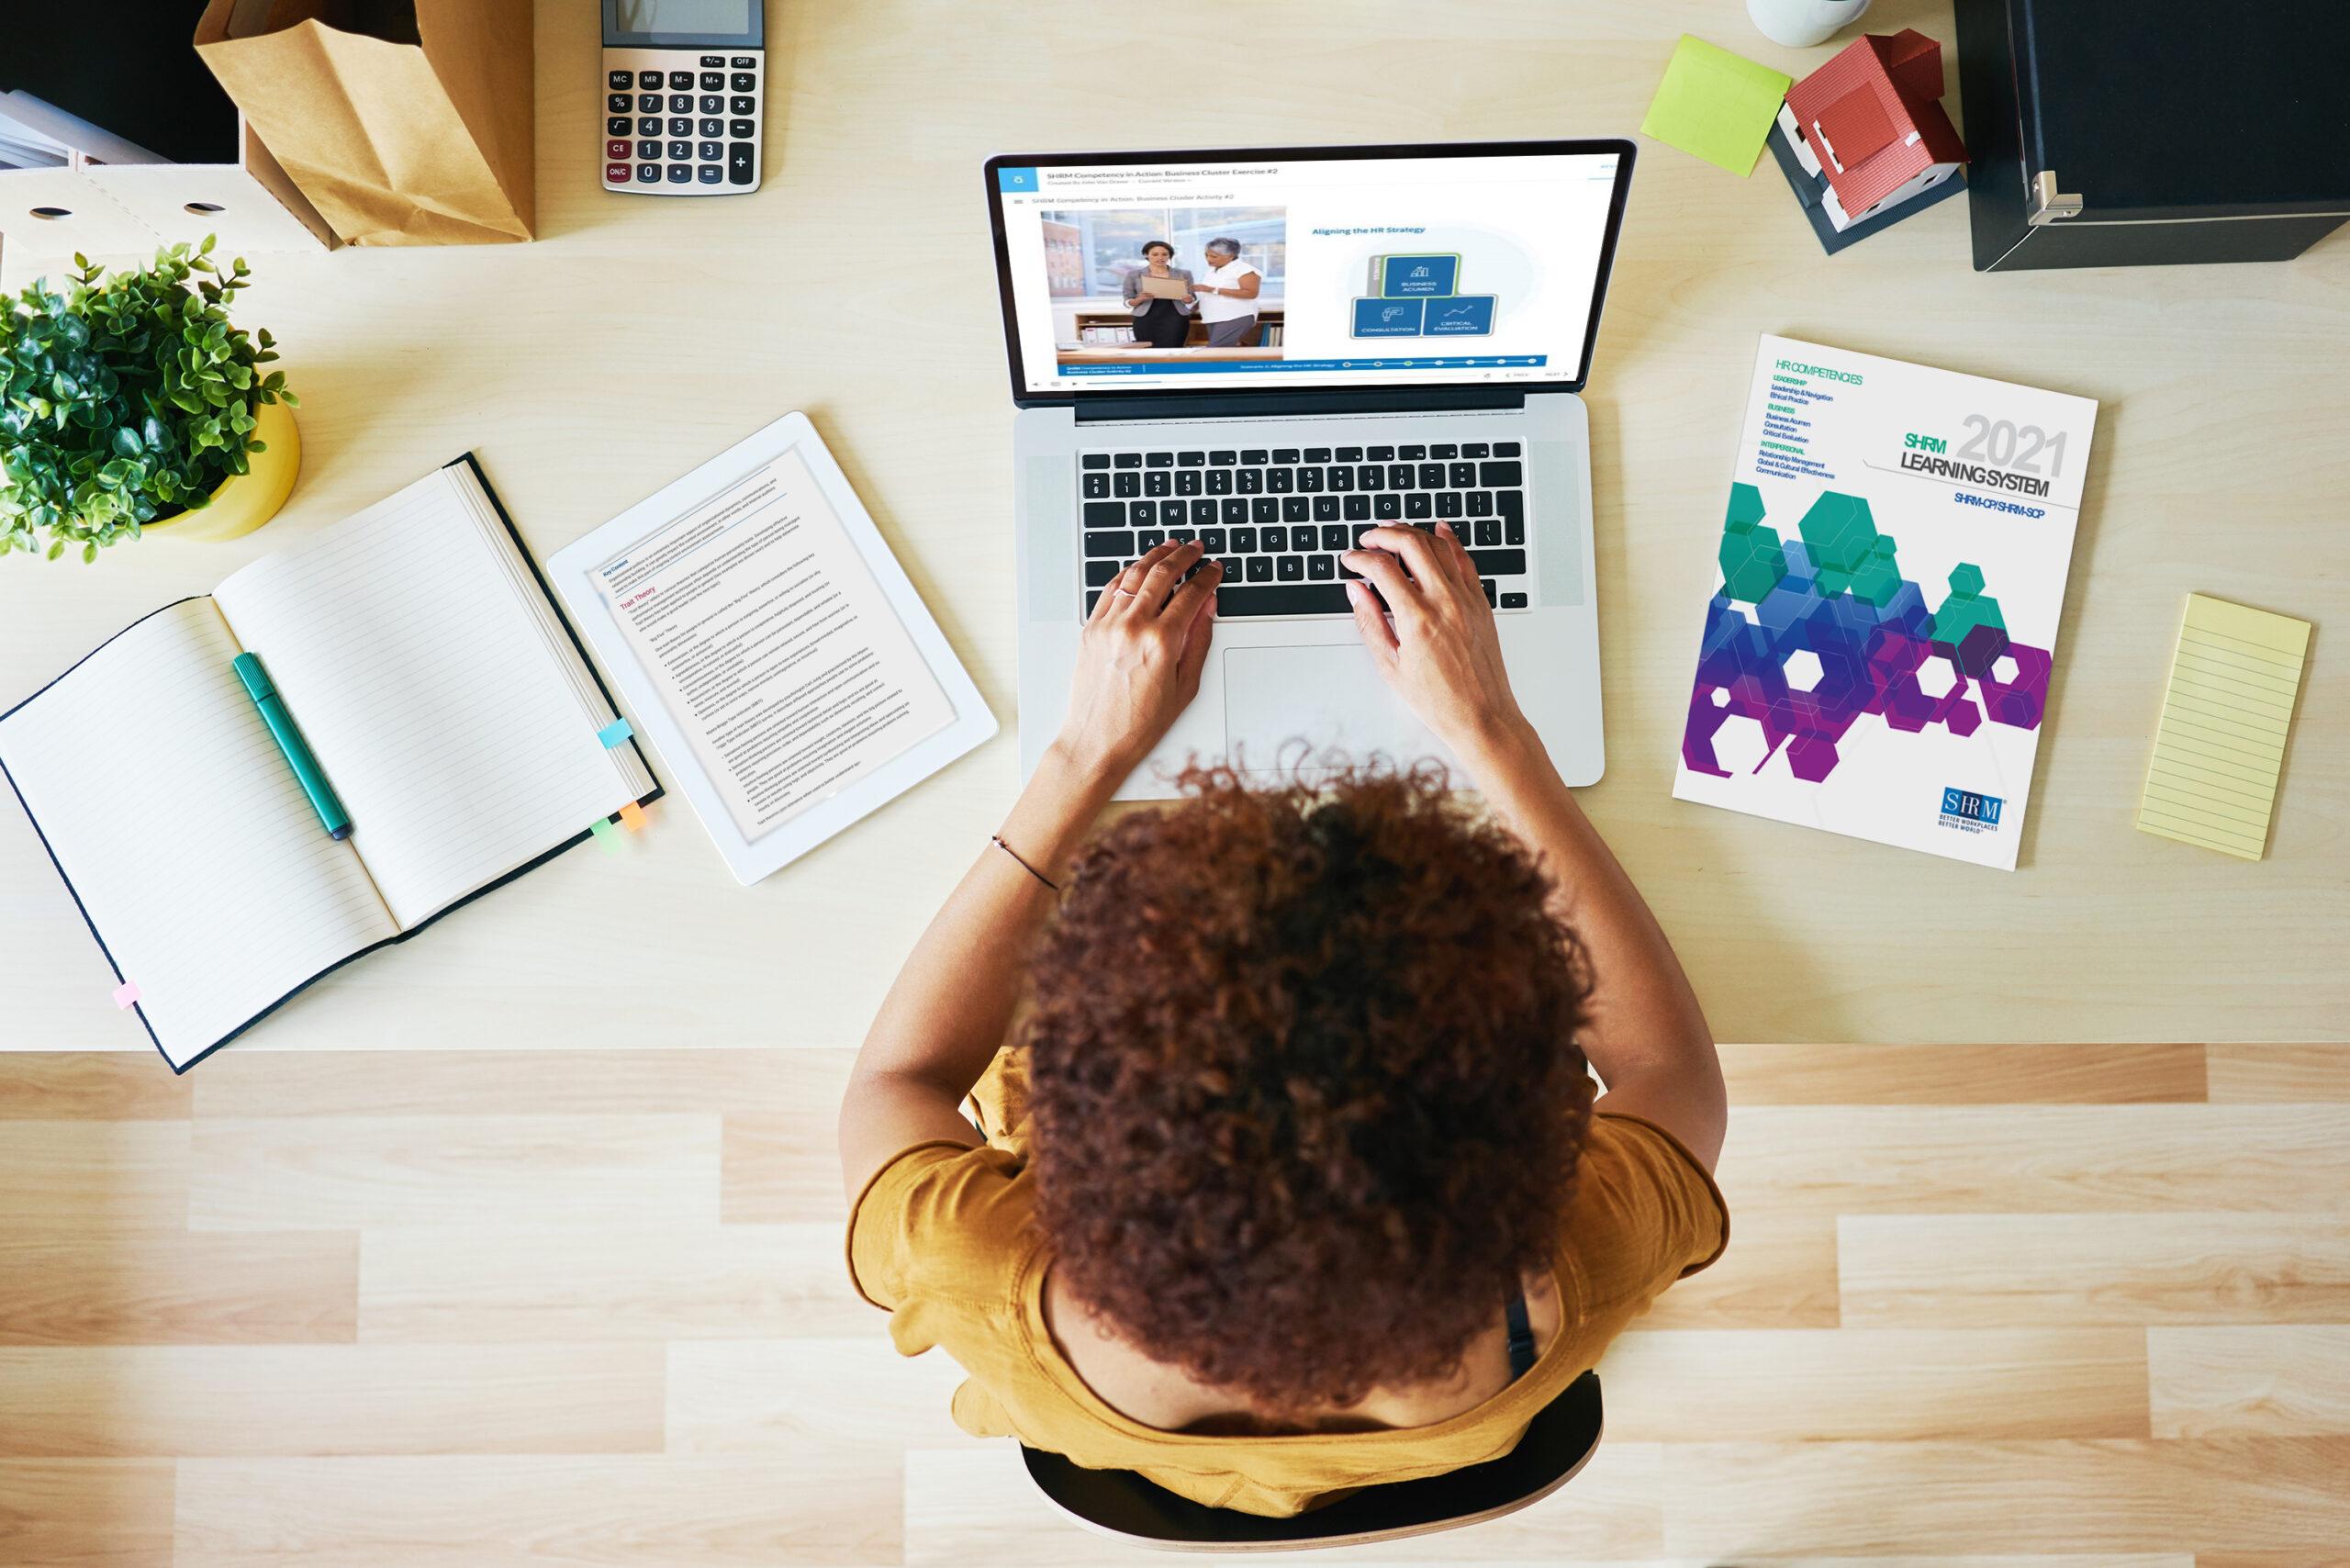 Woman using laptop next to SHRM textbook